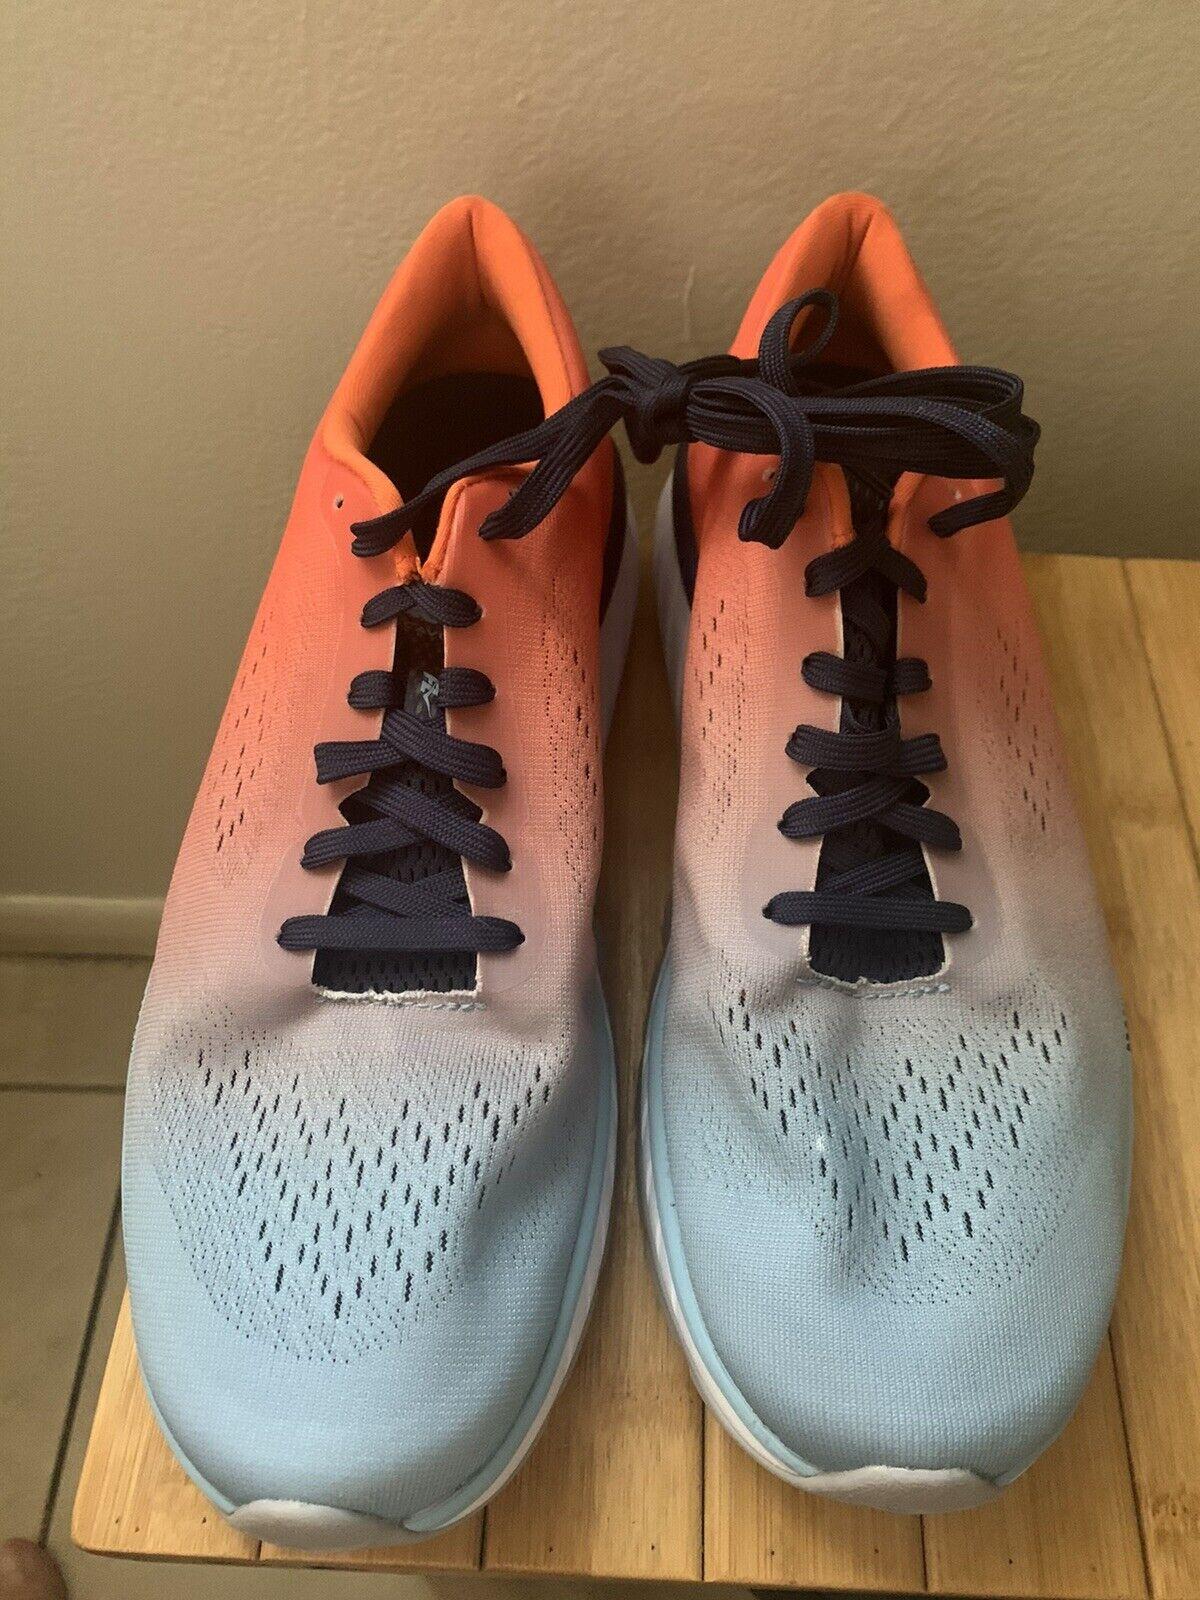 Men's Hoka One One Cavu 2 Running Shoes size 9.5 - image 7